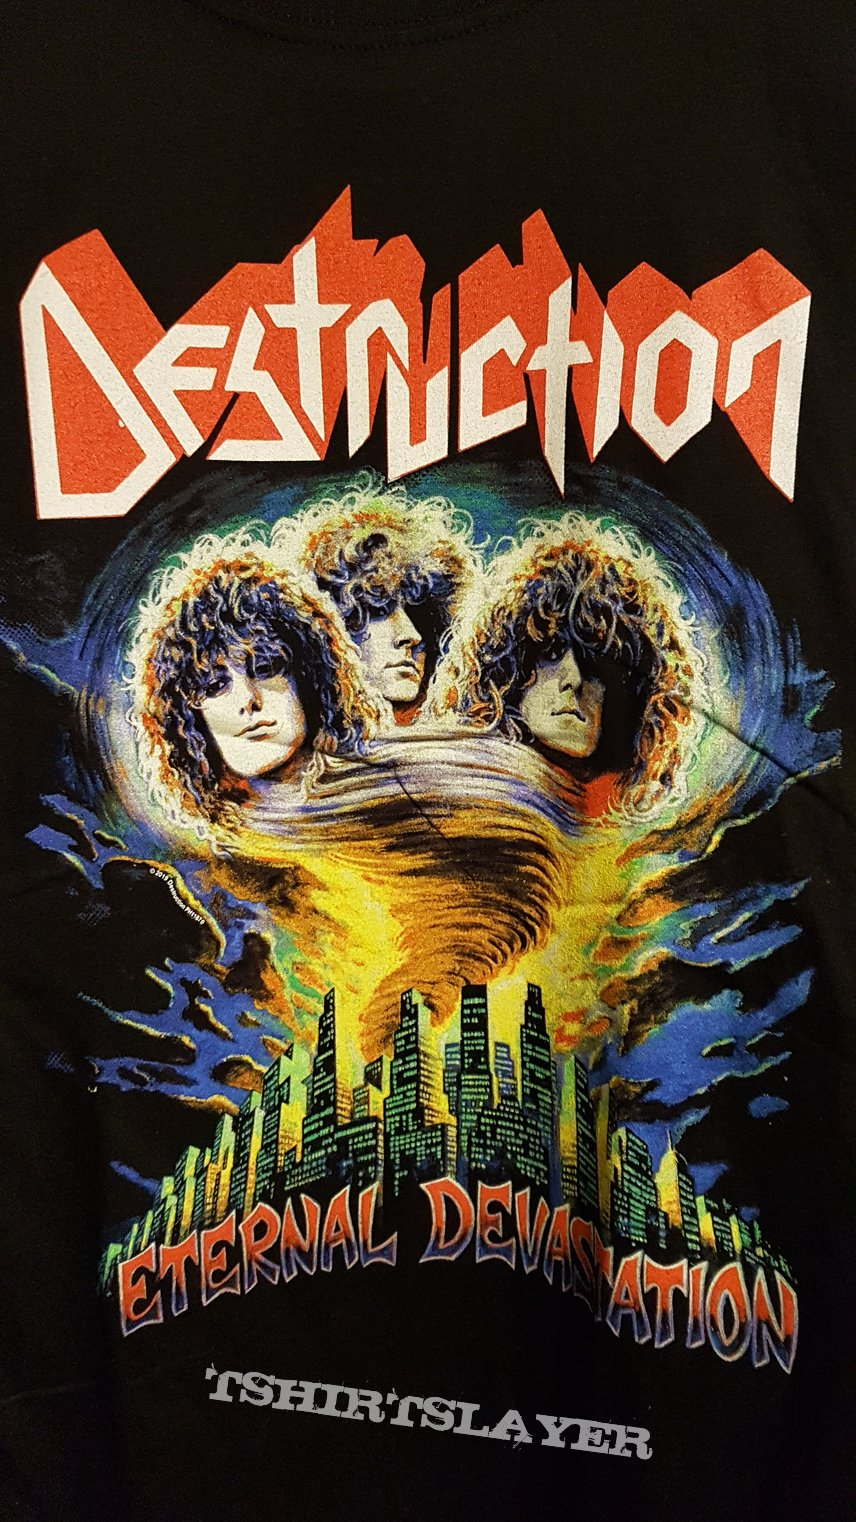 Destruction Eternal Devastation TS